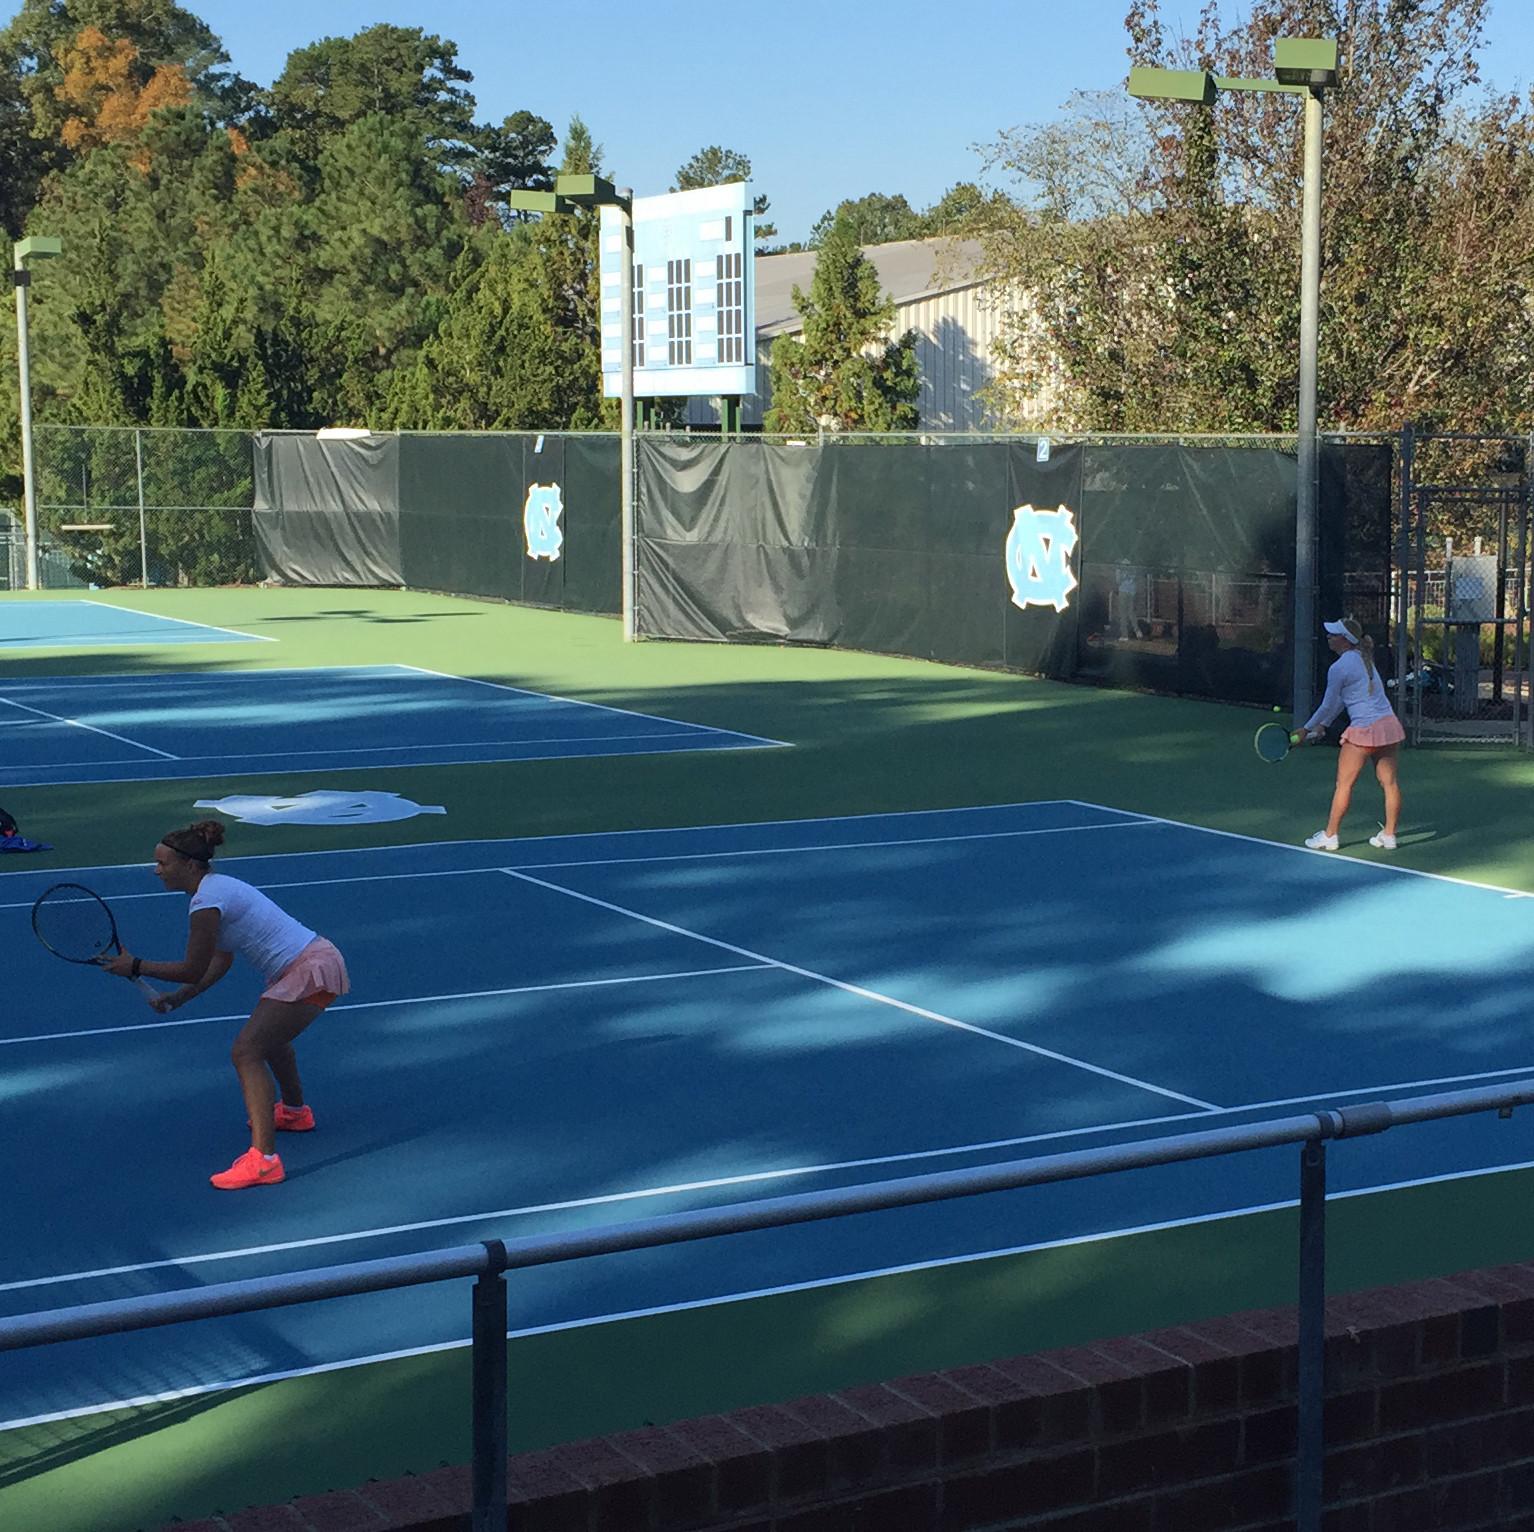 Eidukonyte & Piontek Advance to Doubles Quarterfinals at ITA Carolina Regional